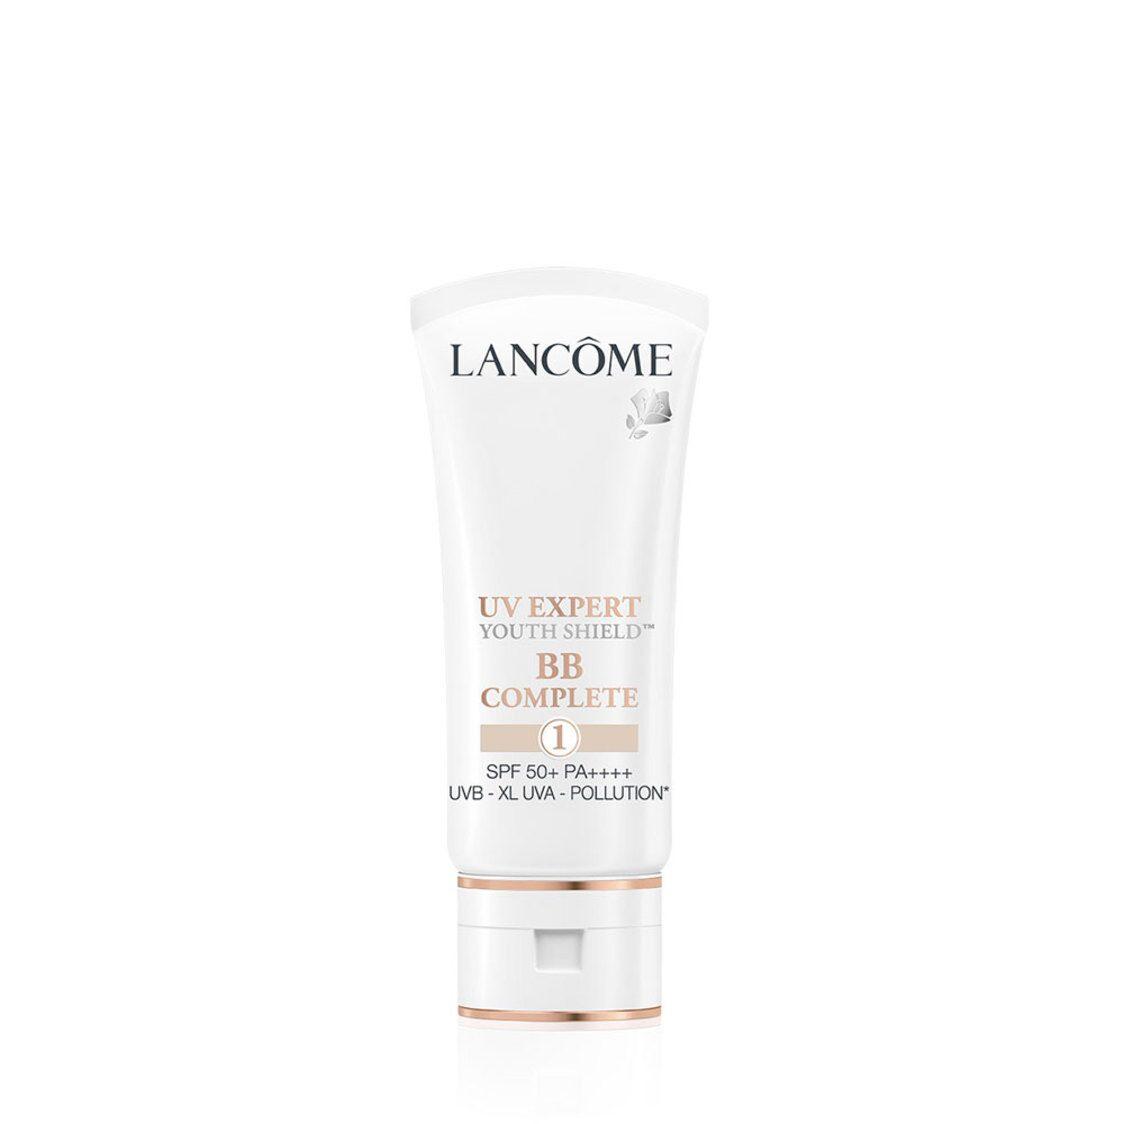 Lancome UV Expert BB Complete 1